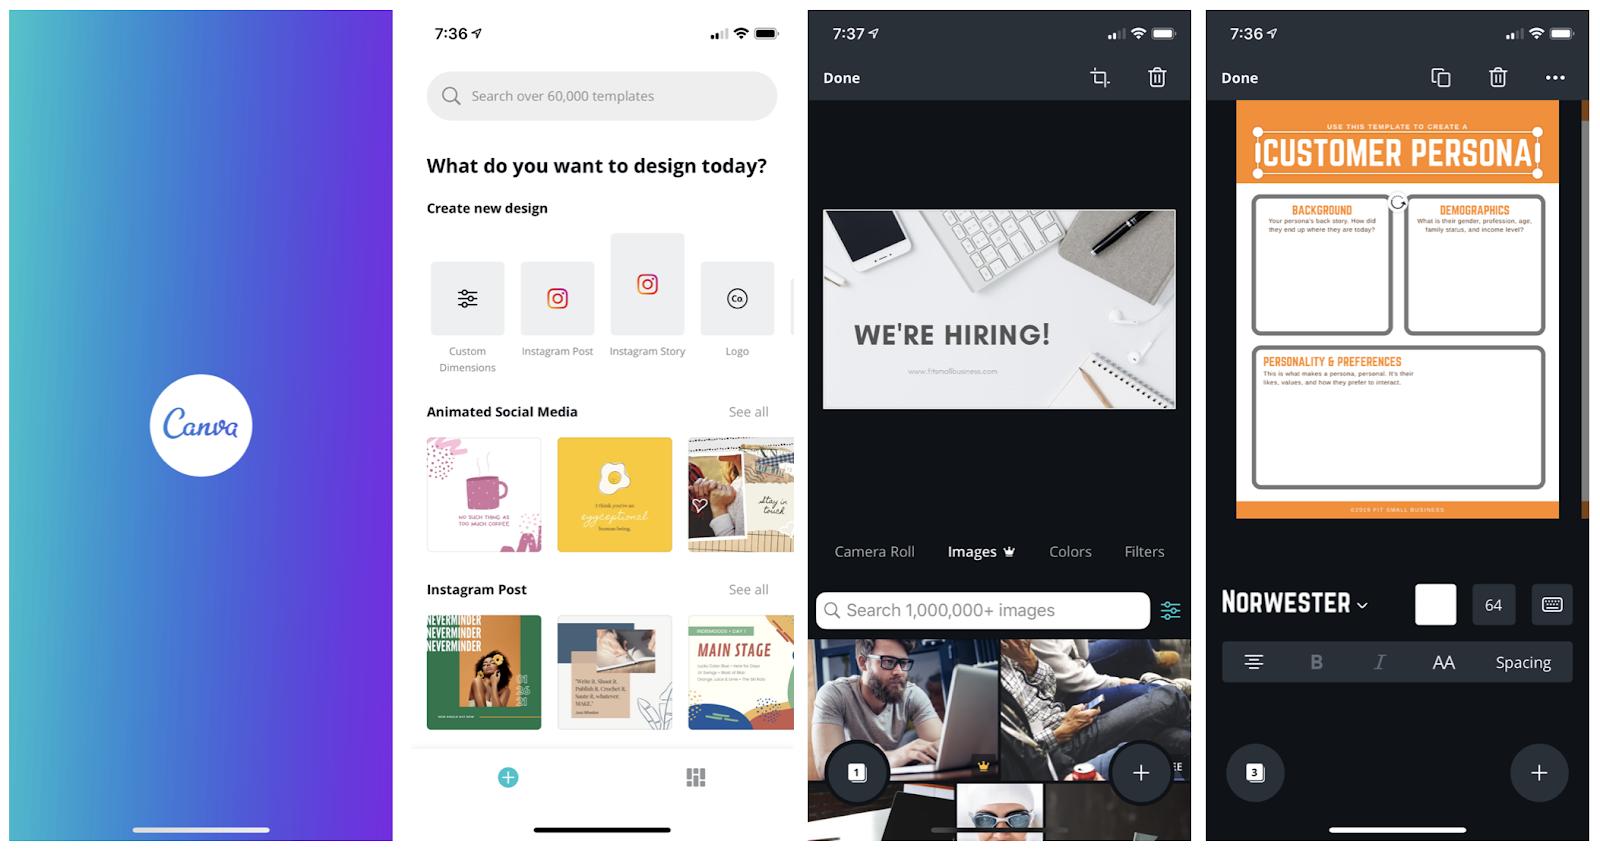 Canva mobile design app interface